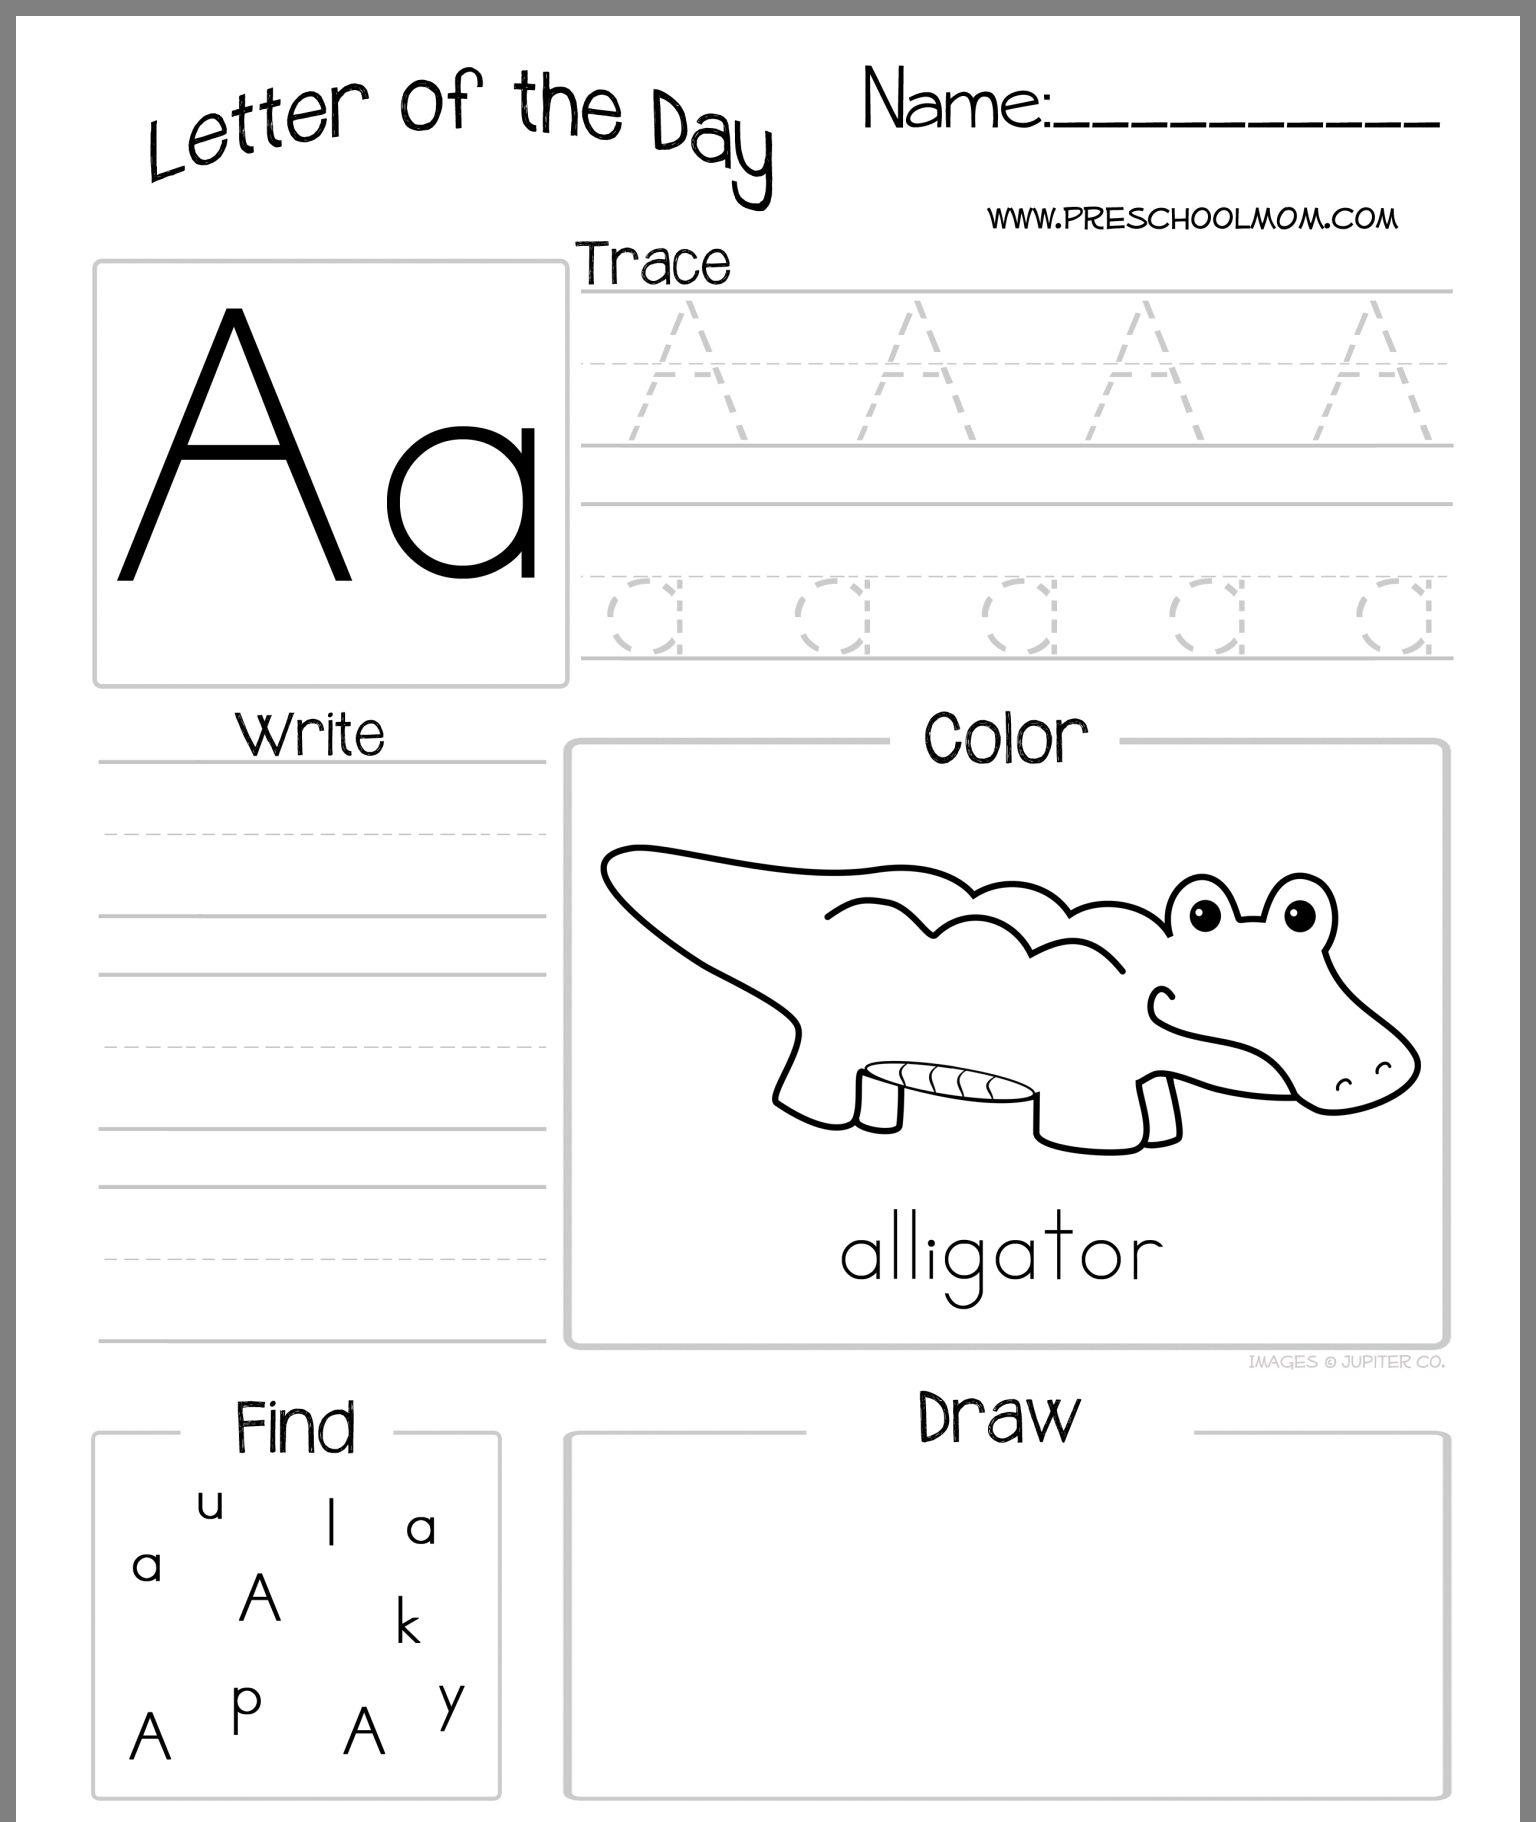 6 Best H J Tracing Letters Printable Worksheets Images On